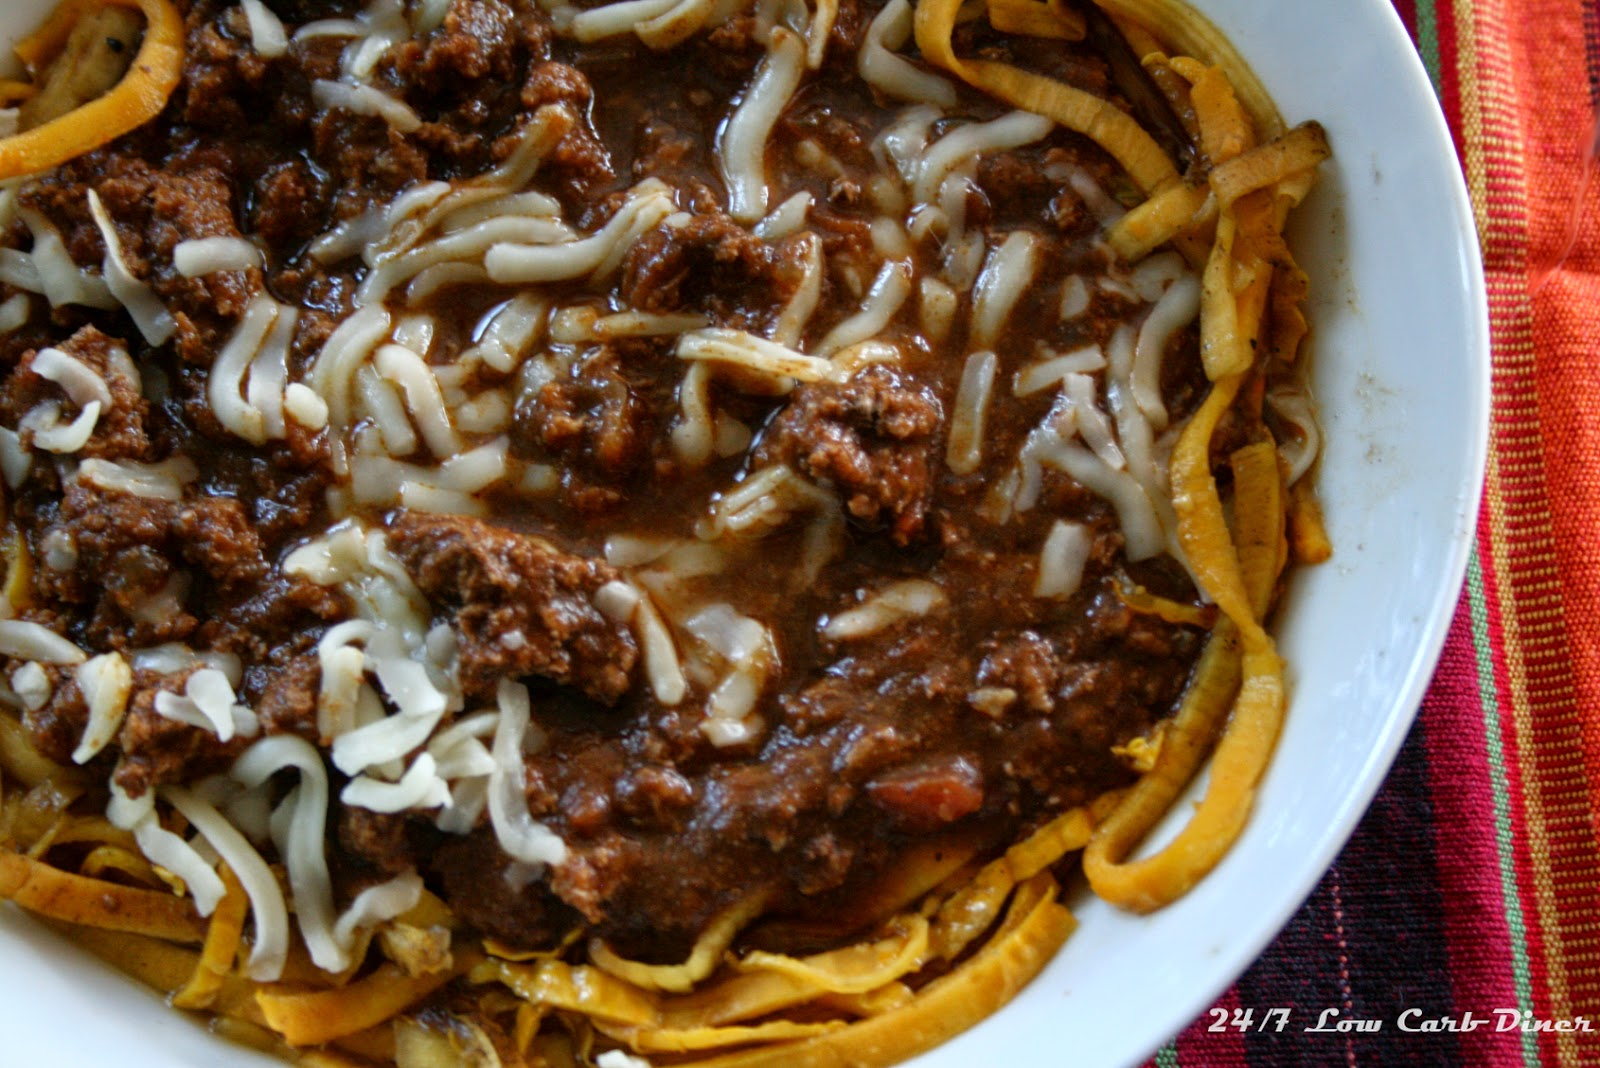 cheater's cincinnati chili --the famous 3 way